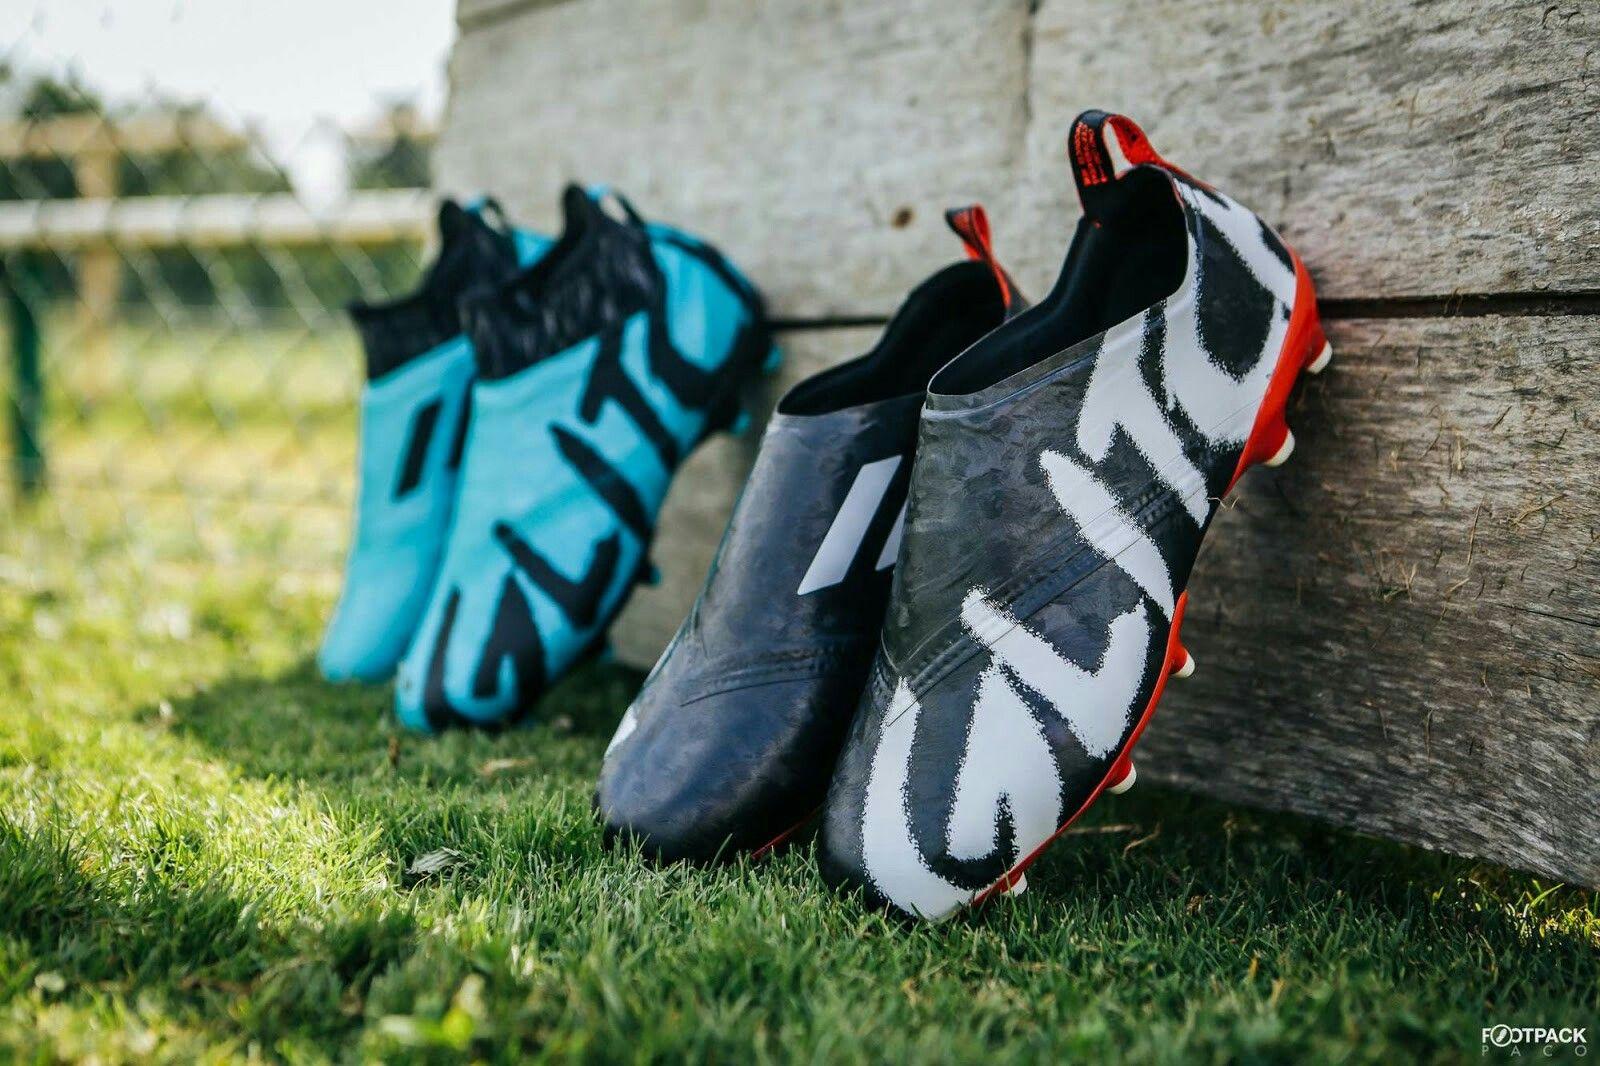 Chaussure Foot Salle Adidas Glitch Skin | Adidas Glitch Skin